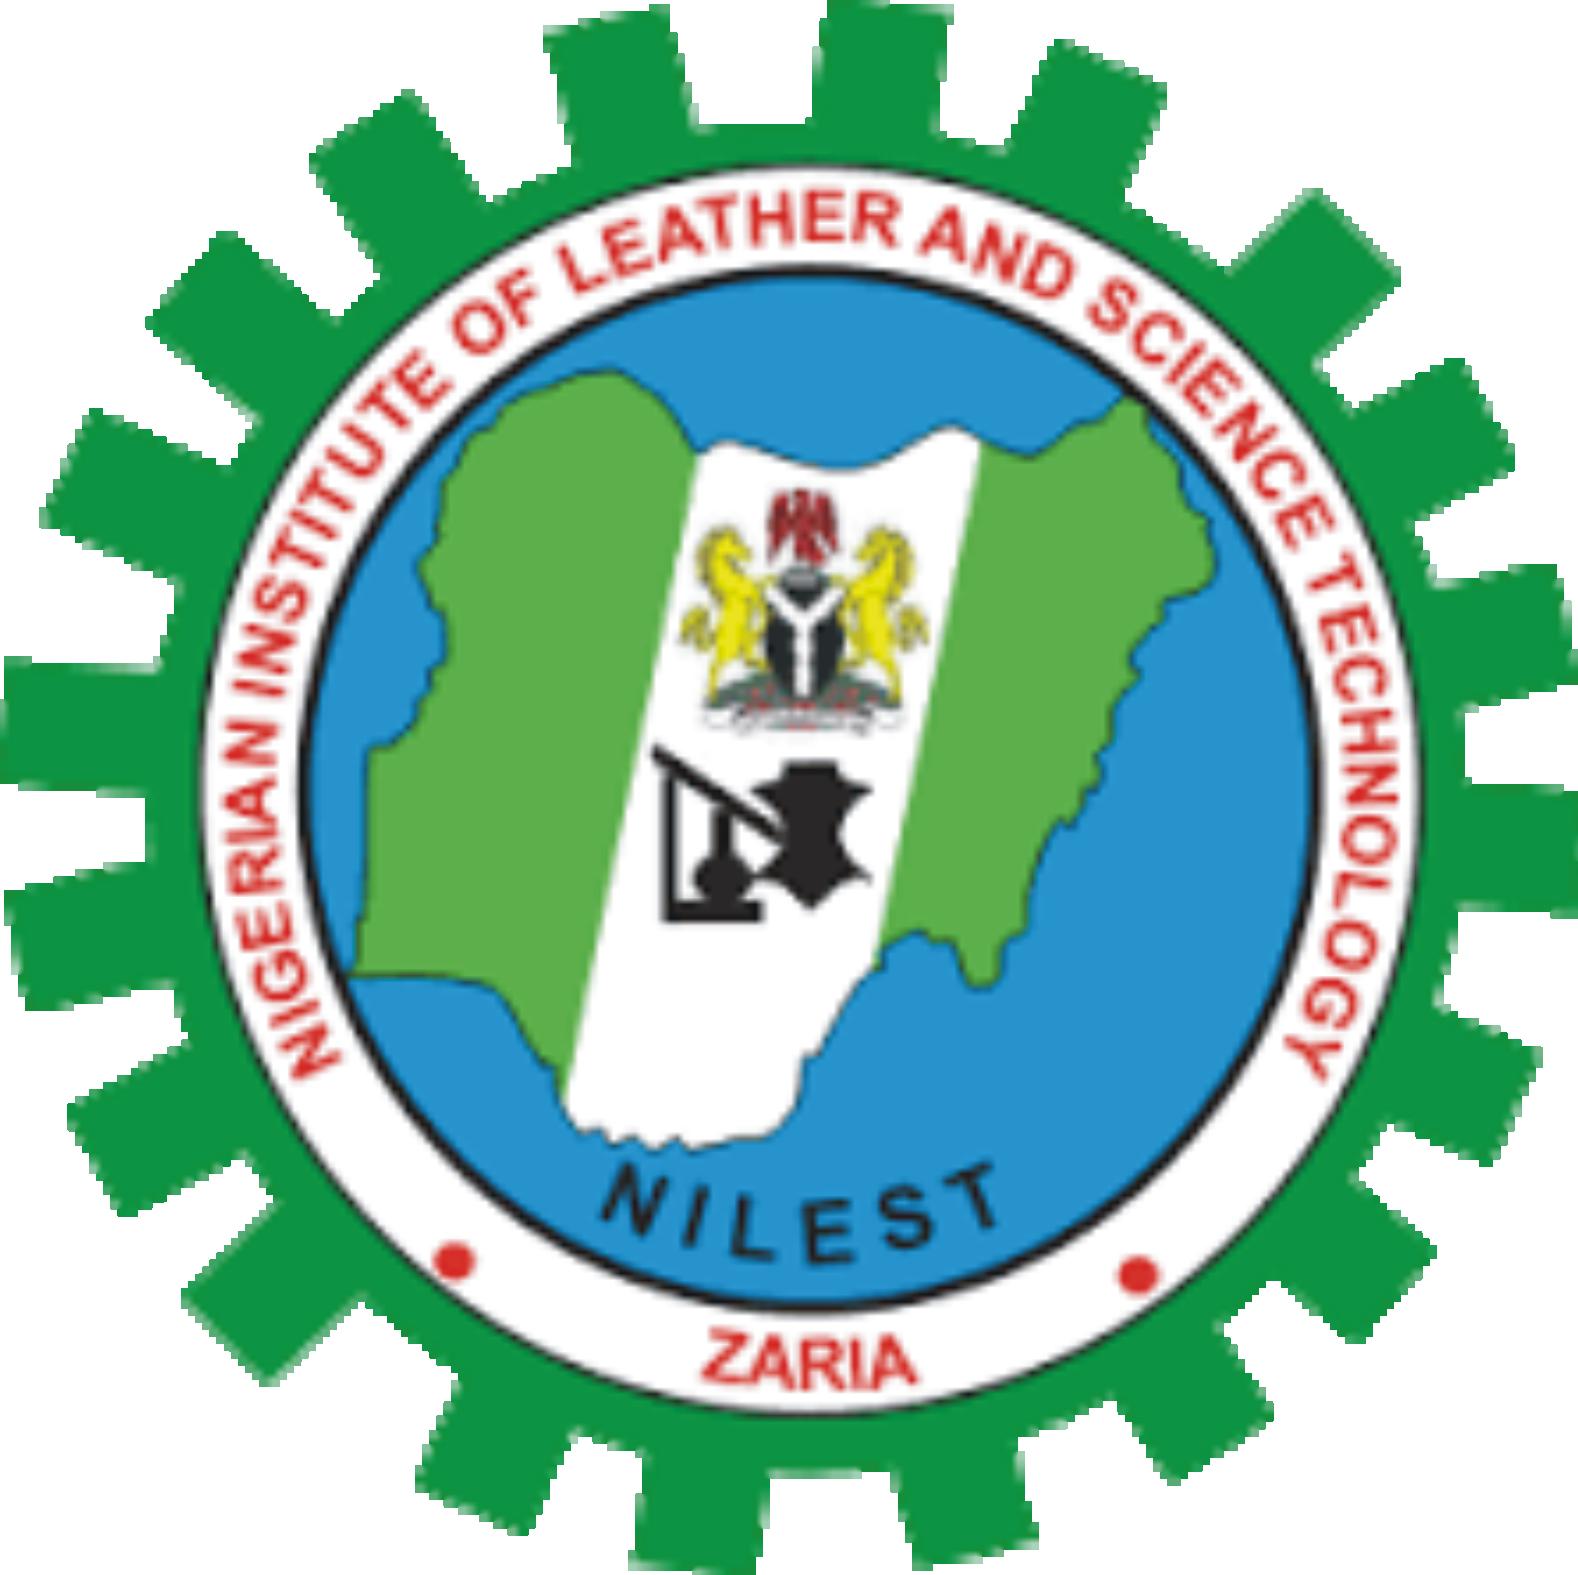 NILEST Logo